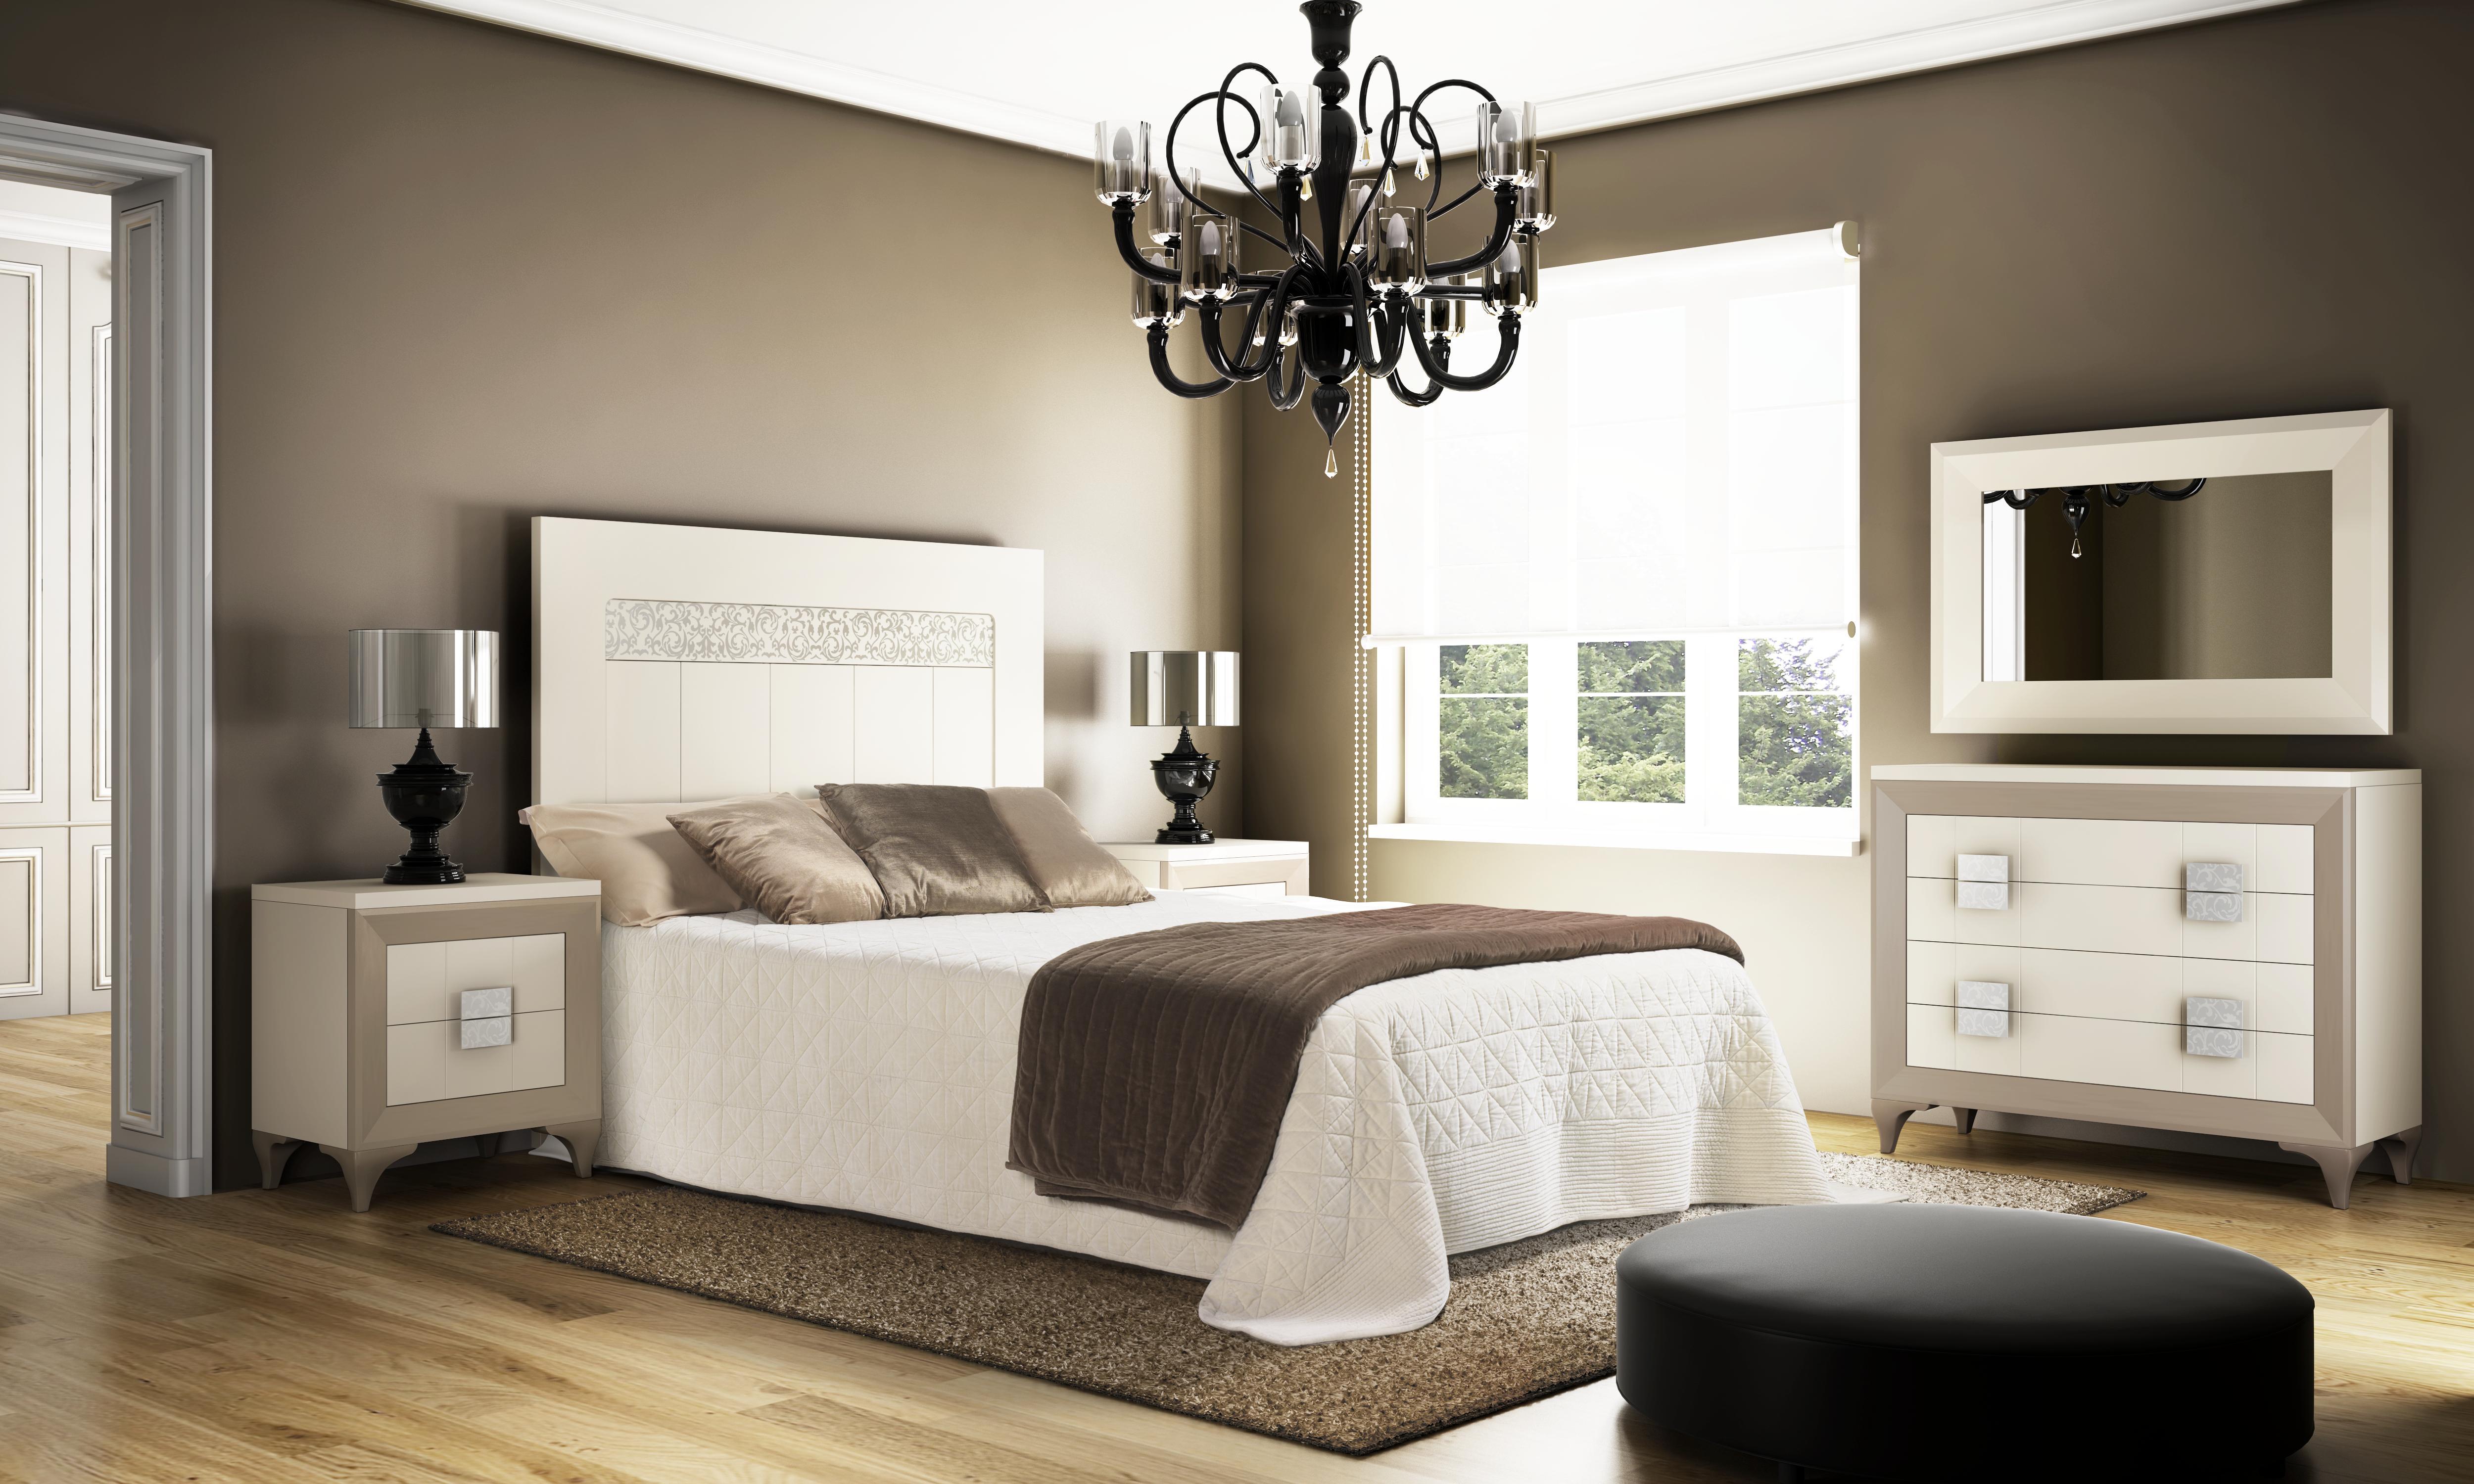 modelos de camas matrimoniales modernas muebles para